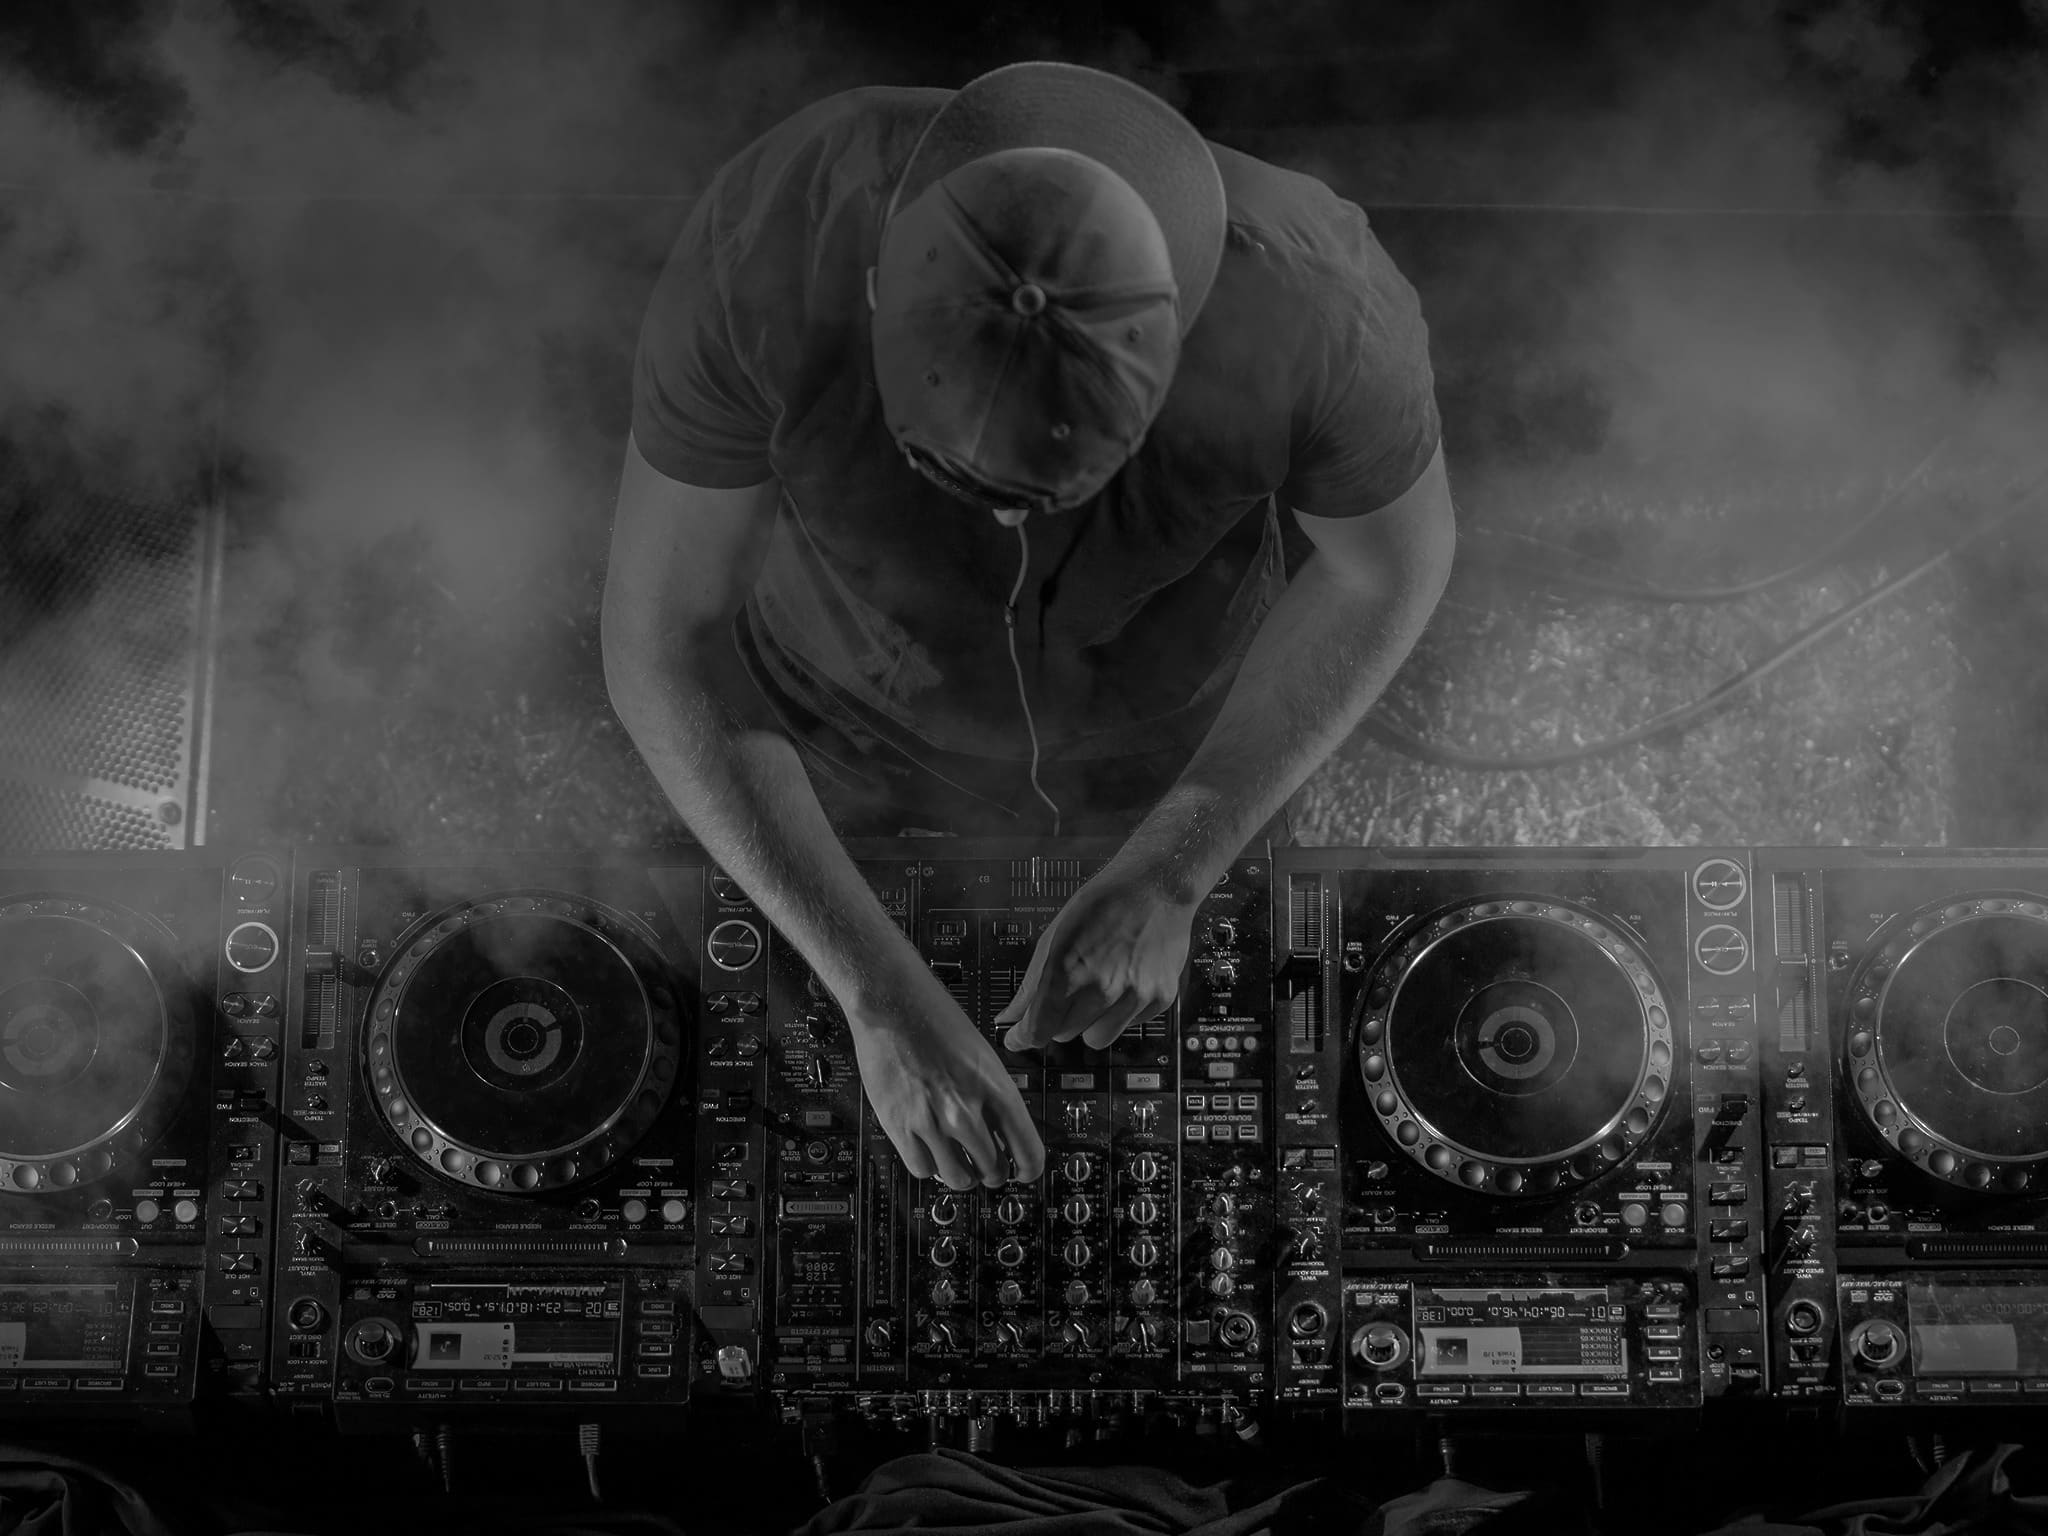 DJ_à_un_concert